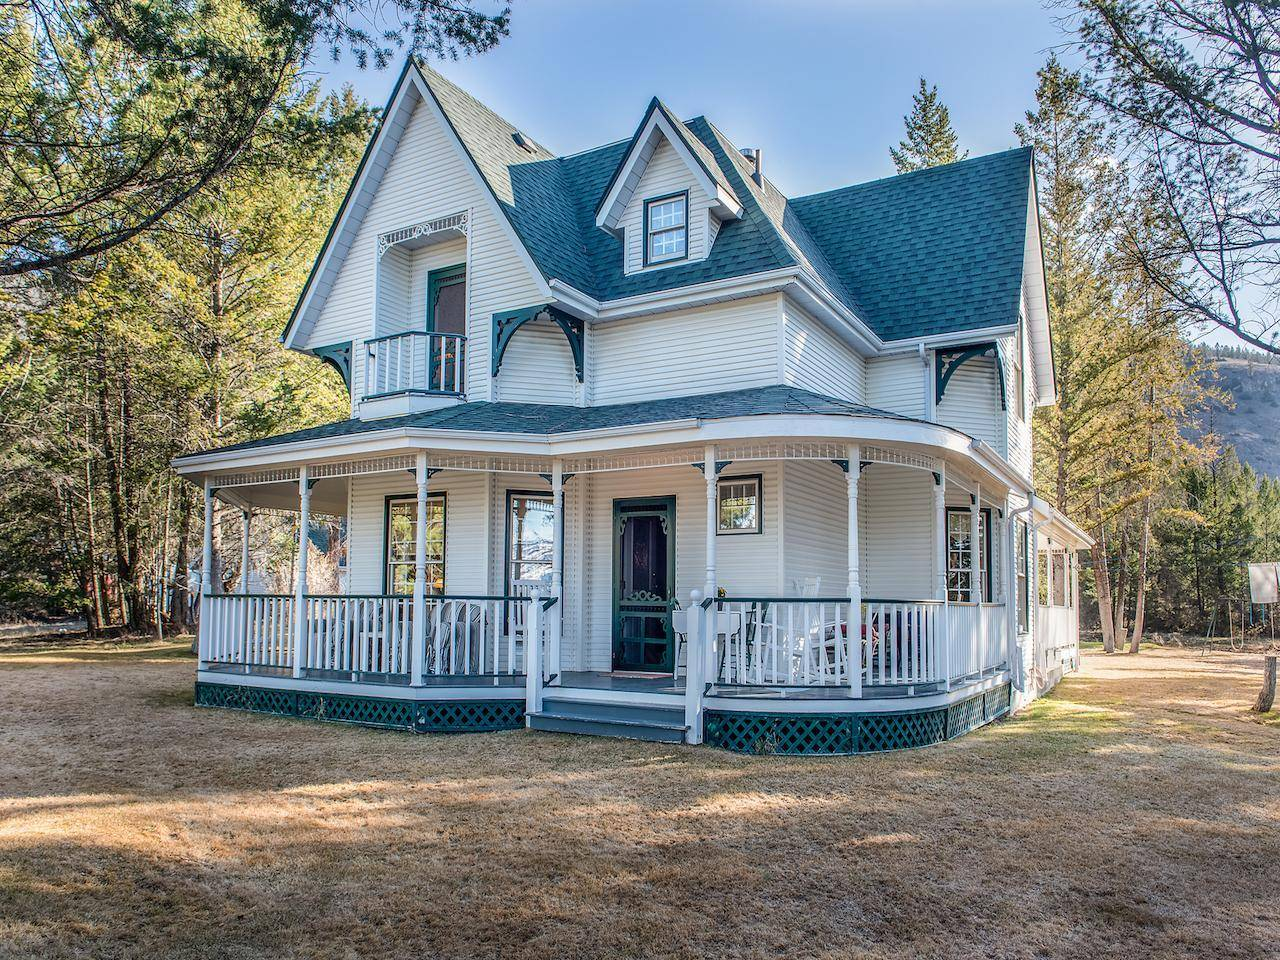 House for sale at 1489 Windermere Loop Road  Windermere British Columbia - MLS: 2451528